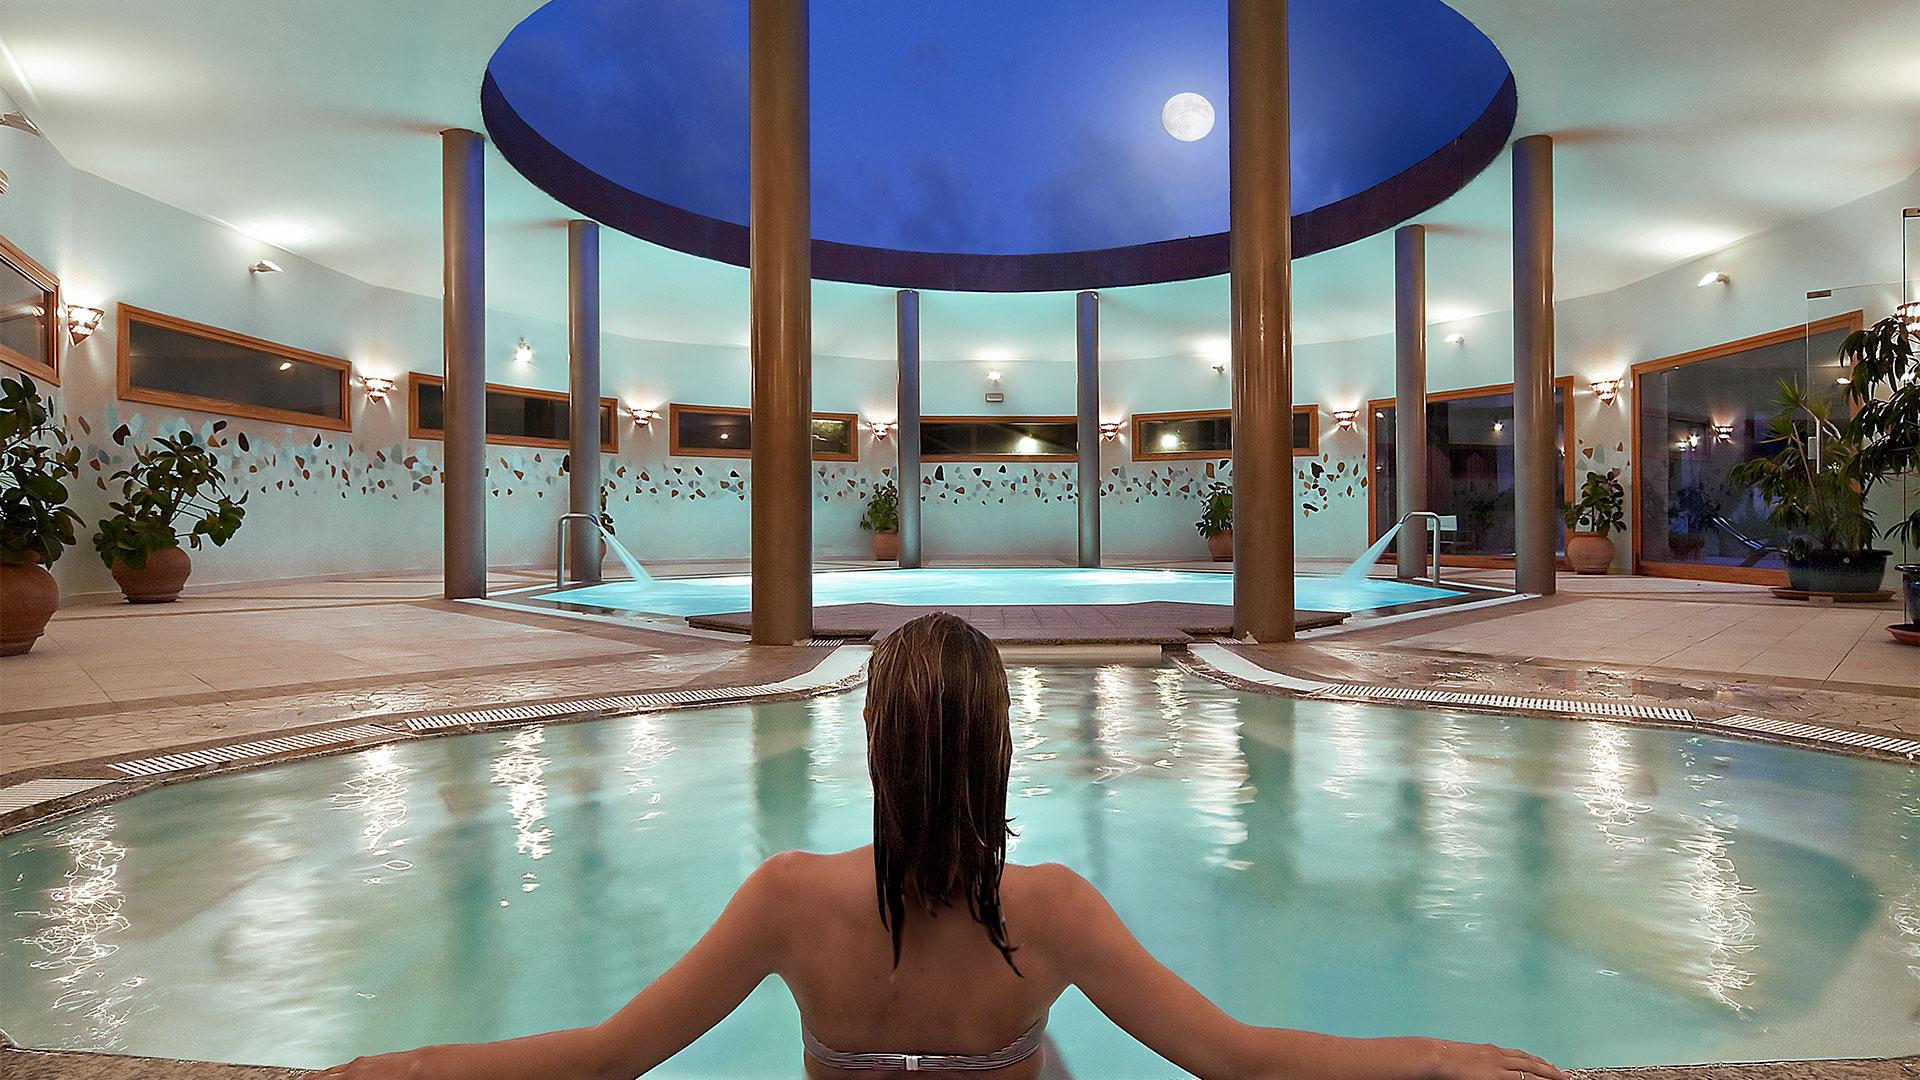 hotel-marinedda-slider-thalasso-piscina-sardegna-isola-rossa-1